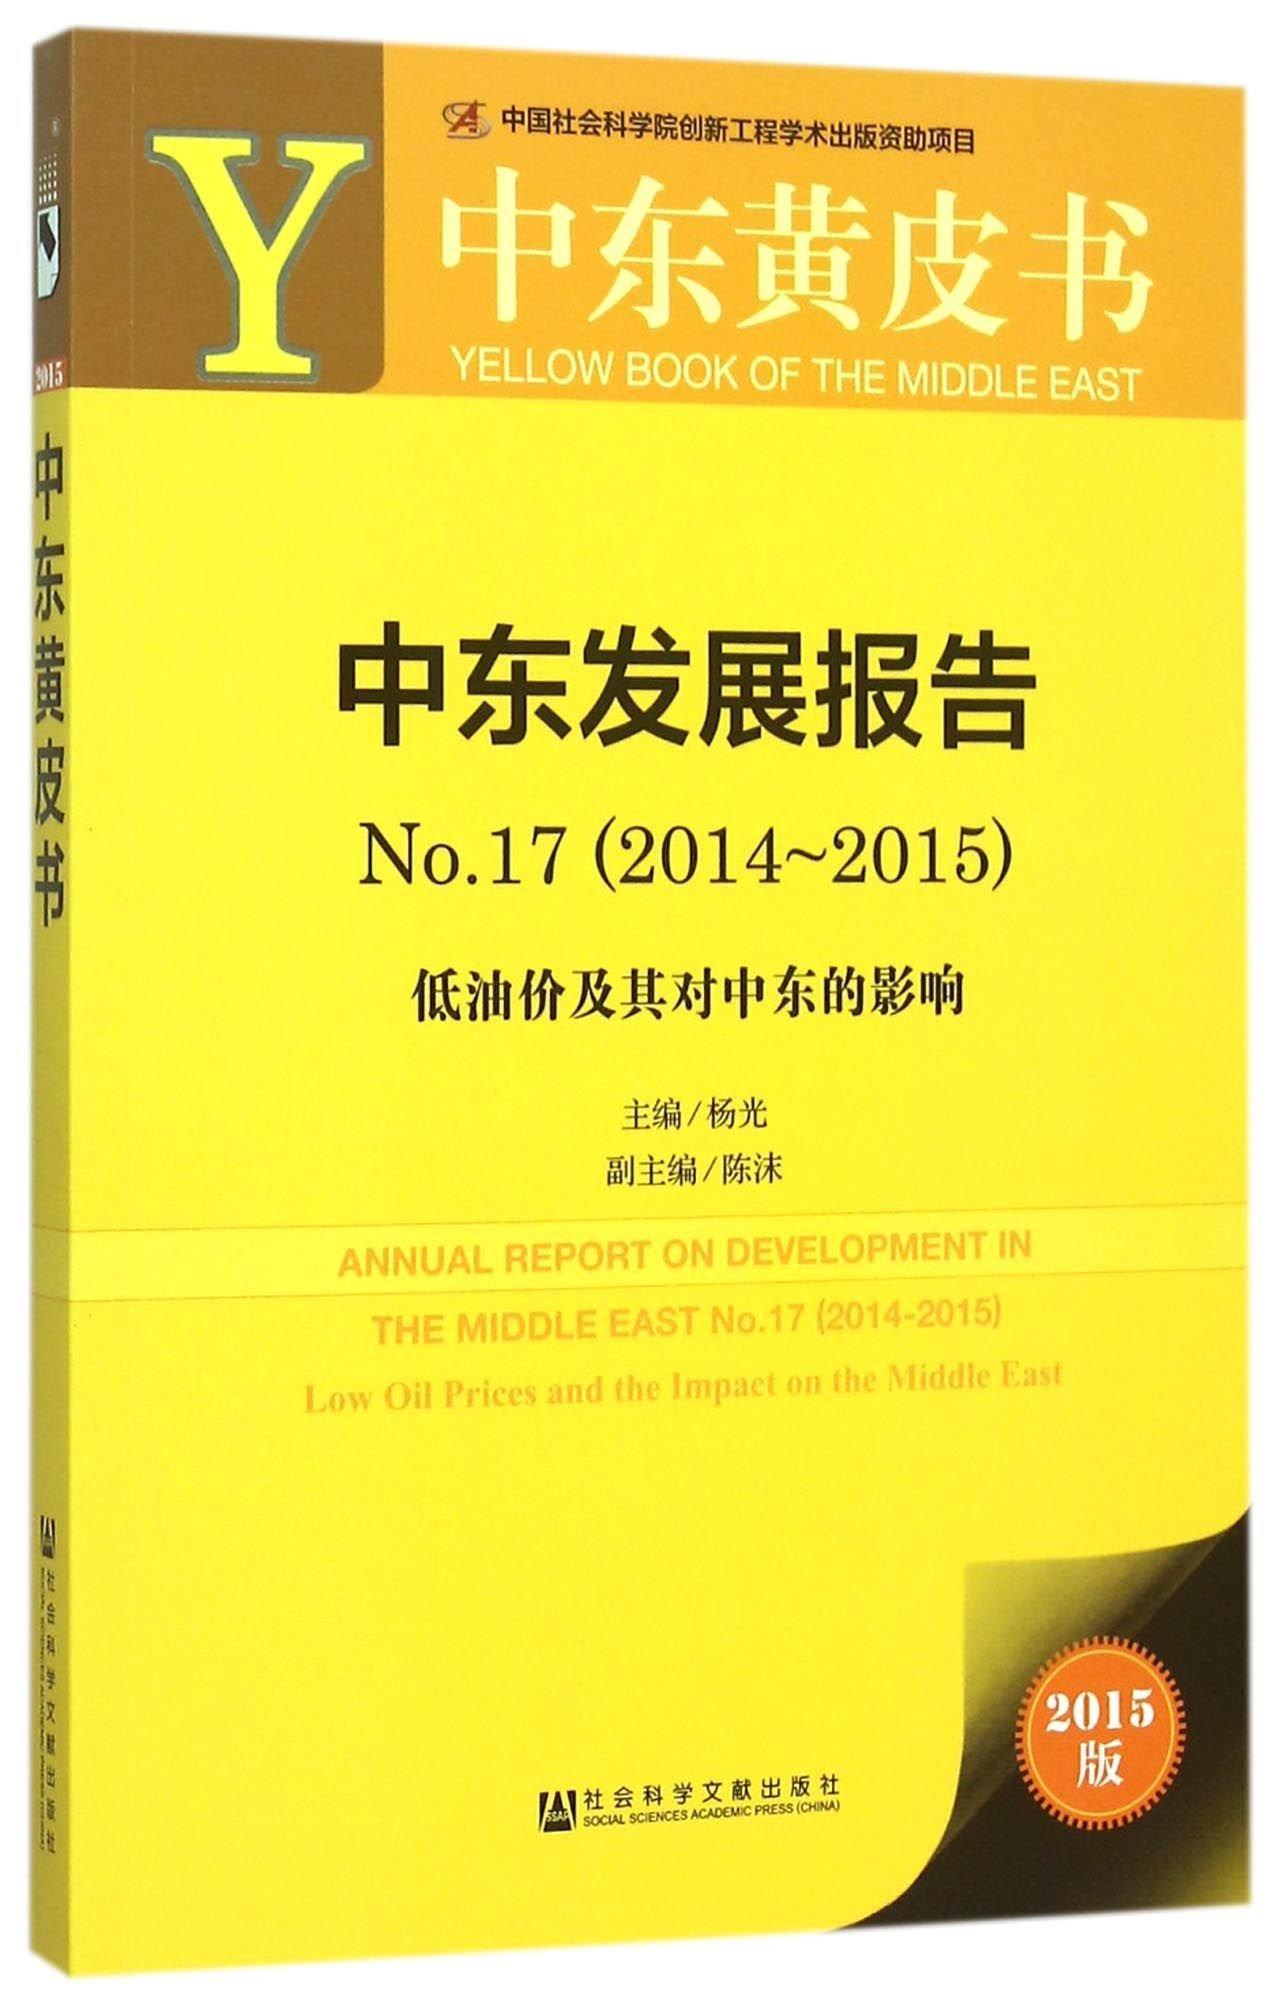 Download 中东发展报告(2015版2014-2015No.17低油价及其对中东的影响)/中东黄皮书 pdf